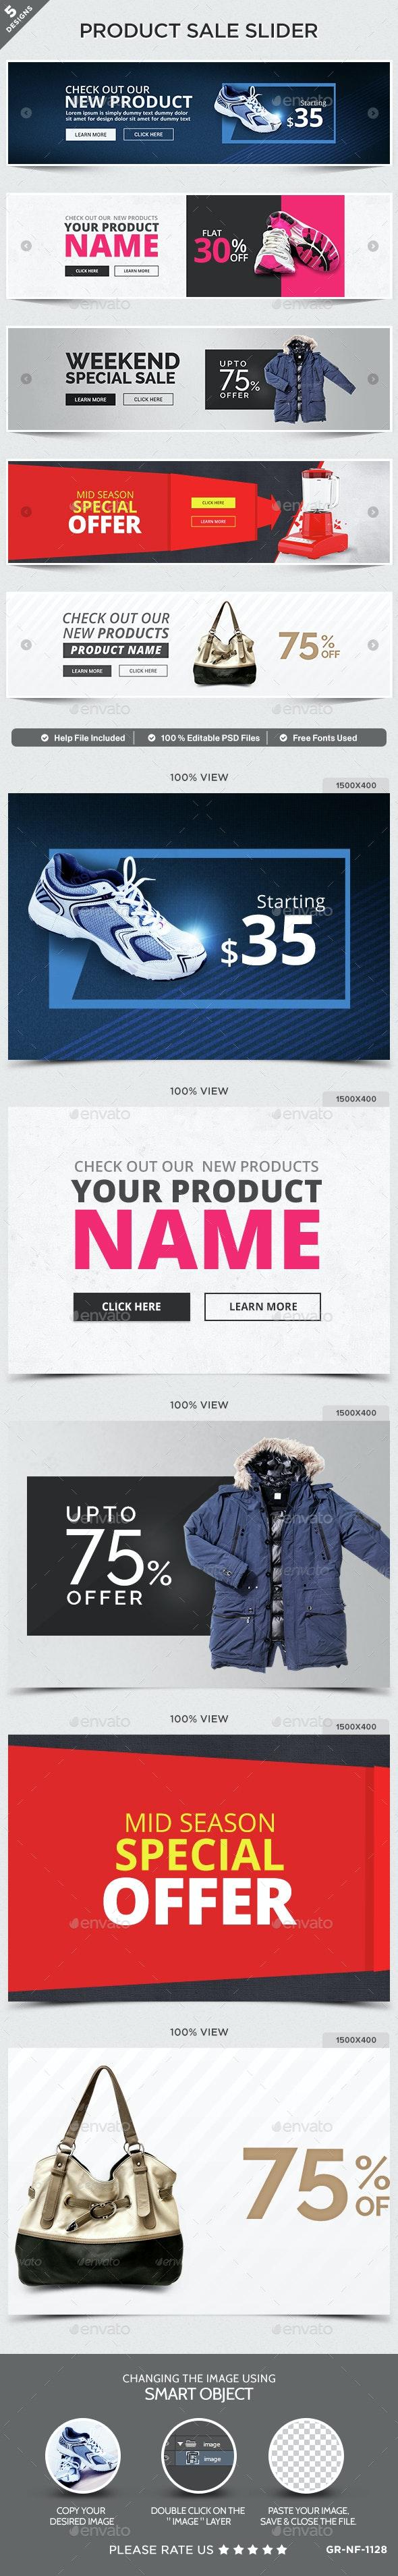 Product Sale Sliders -  5 Designs - Sliders & Features Web Elements